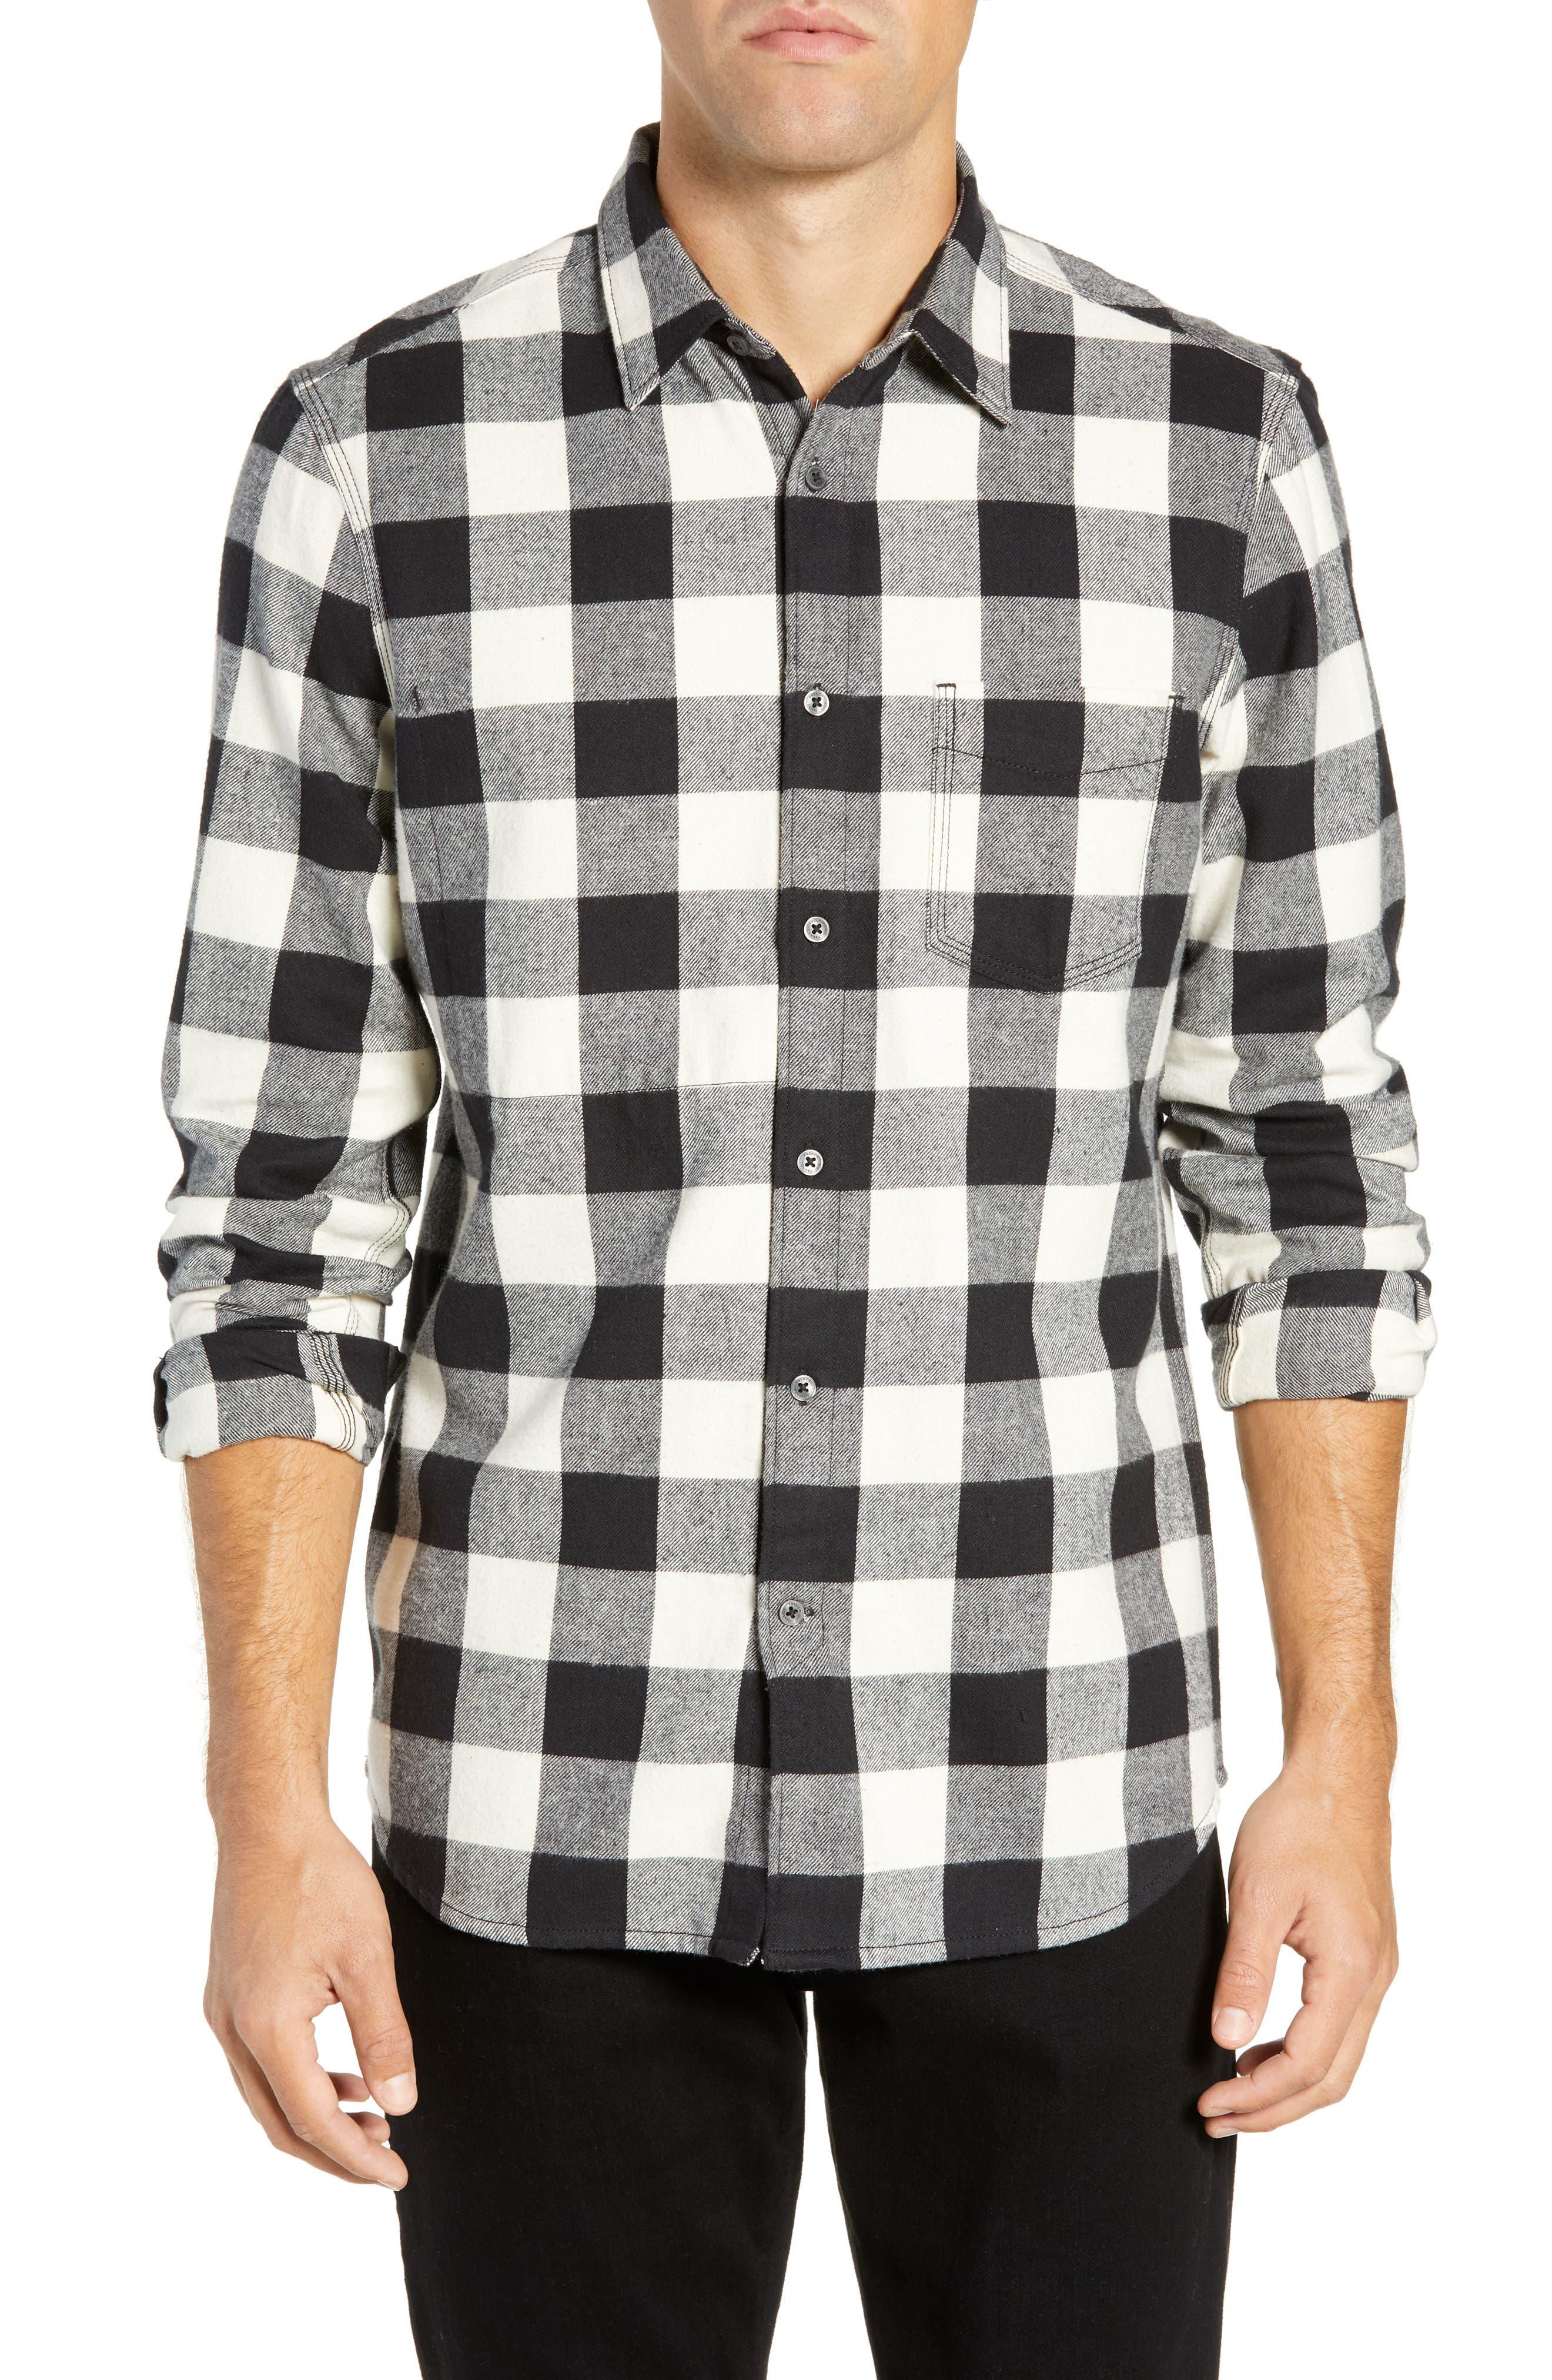 Kahama Regular Fit Flannel Sport Shirt,                             Main thumbnail 1, color,                             BLACK WHITECAP GREY